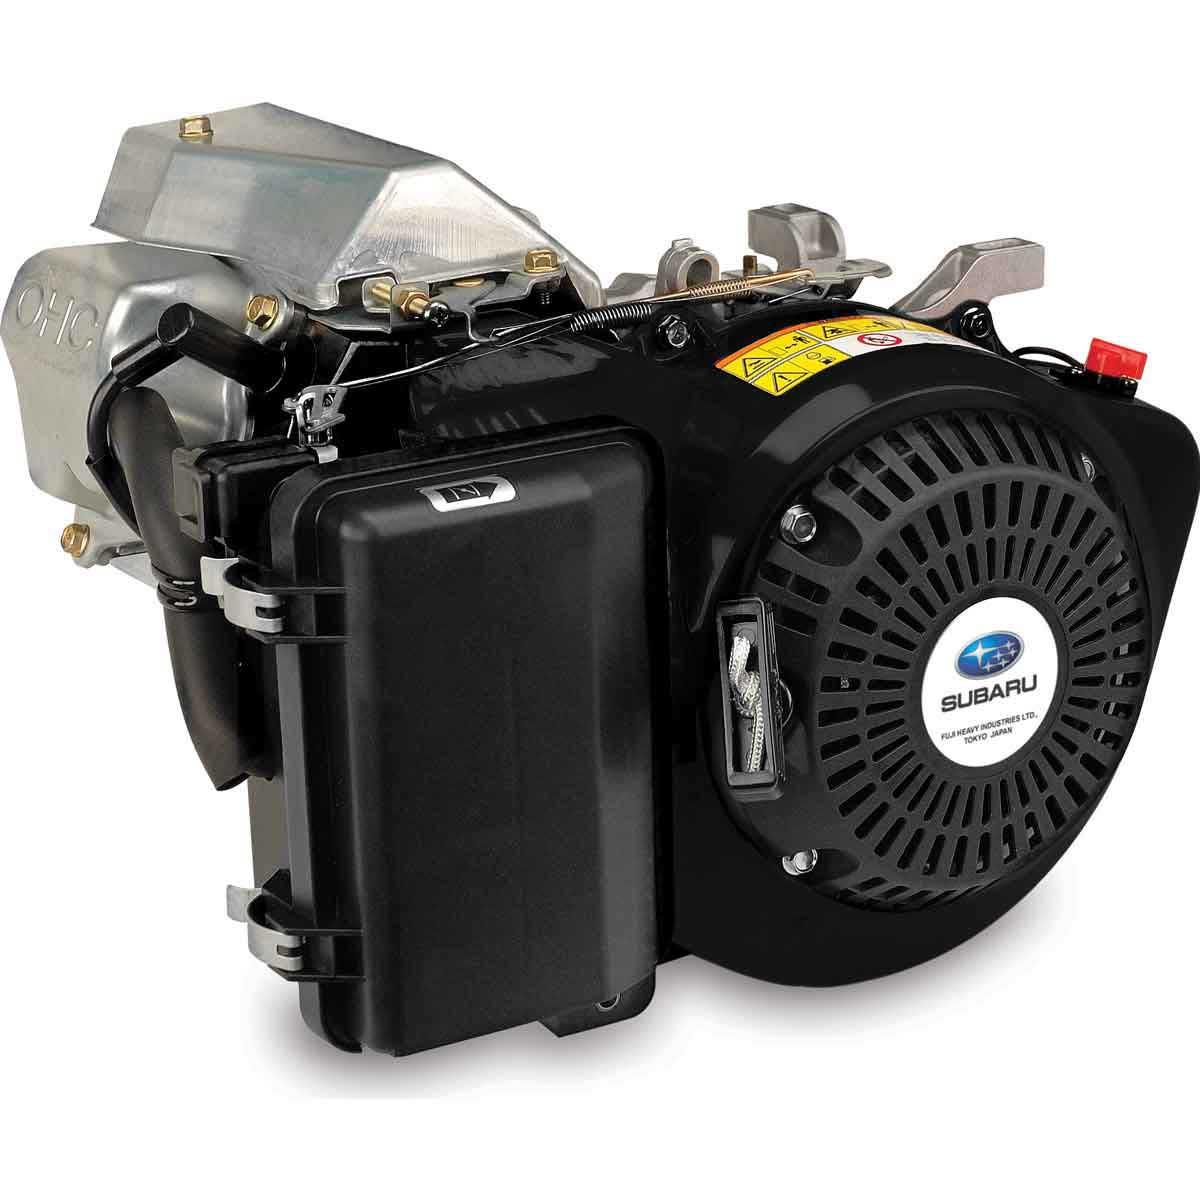 9 1/2hp gas engine Subaru portable generator